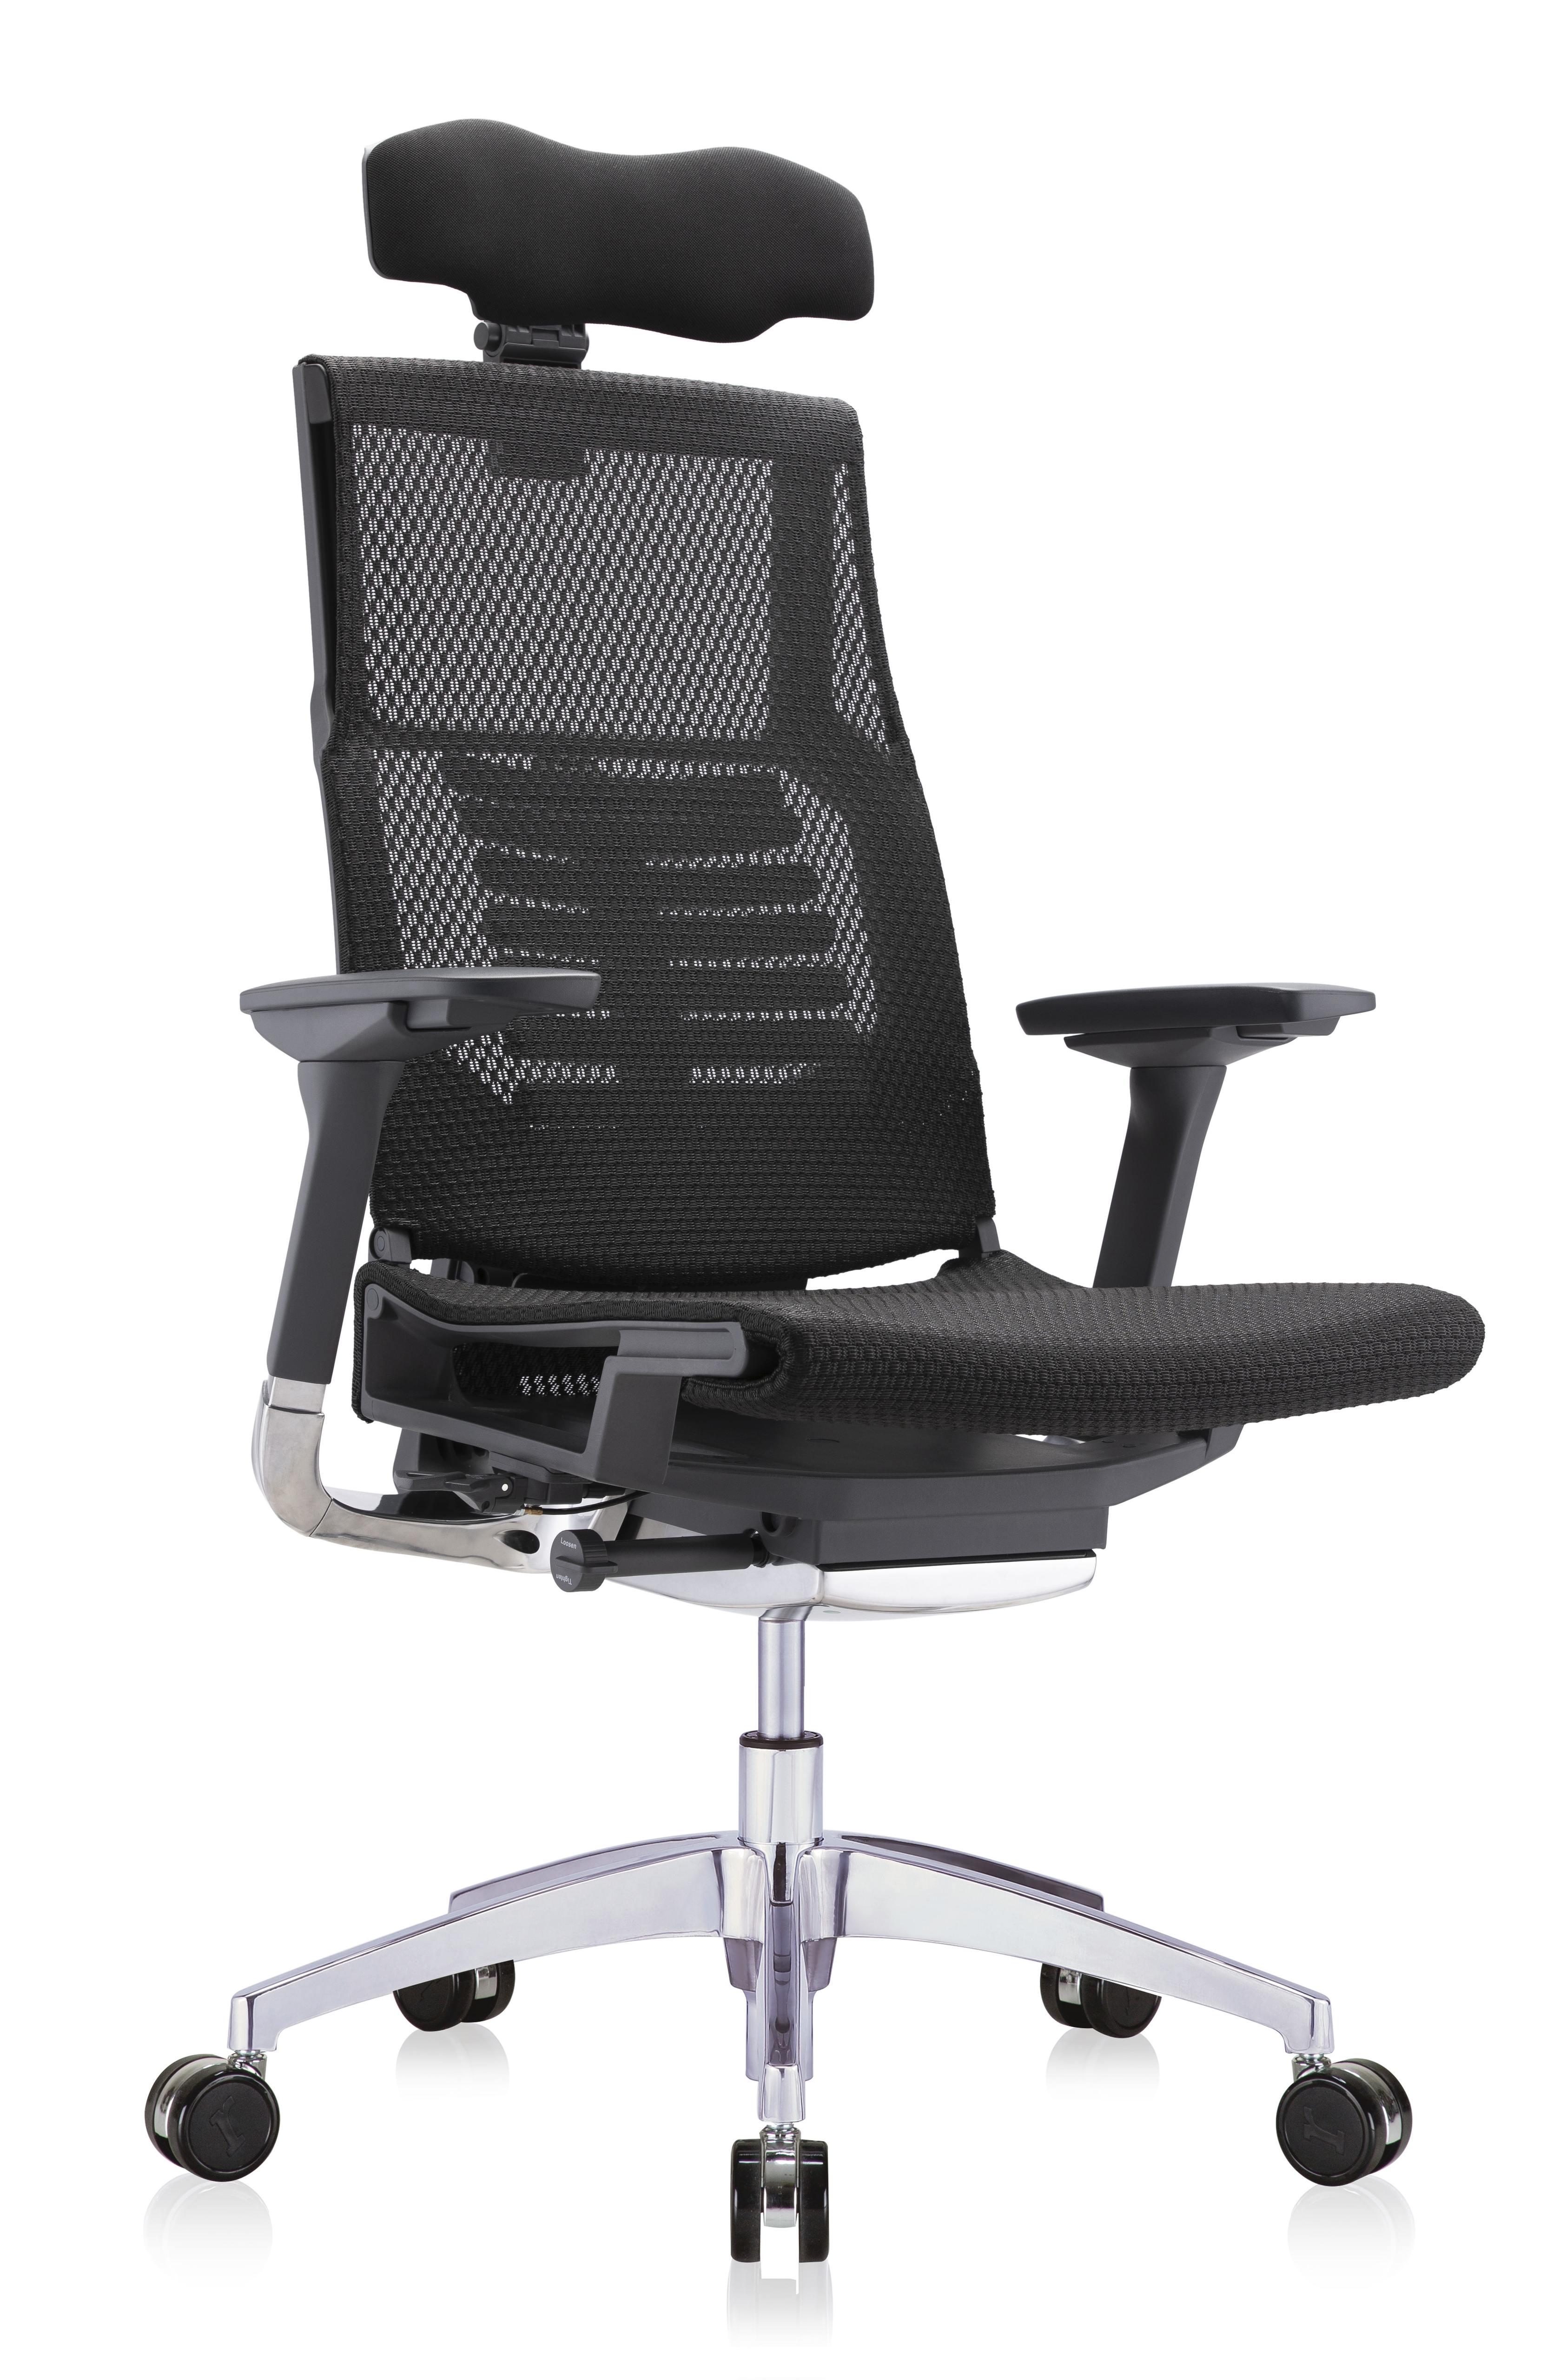 eurotech powerfit chair with headrest